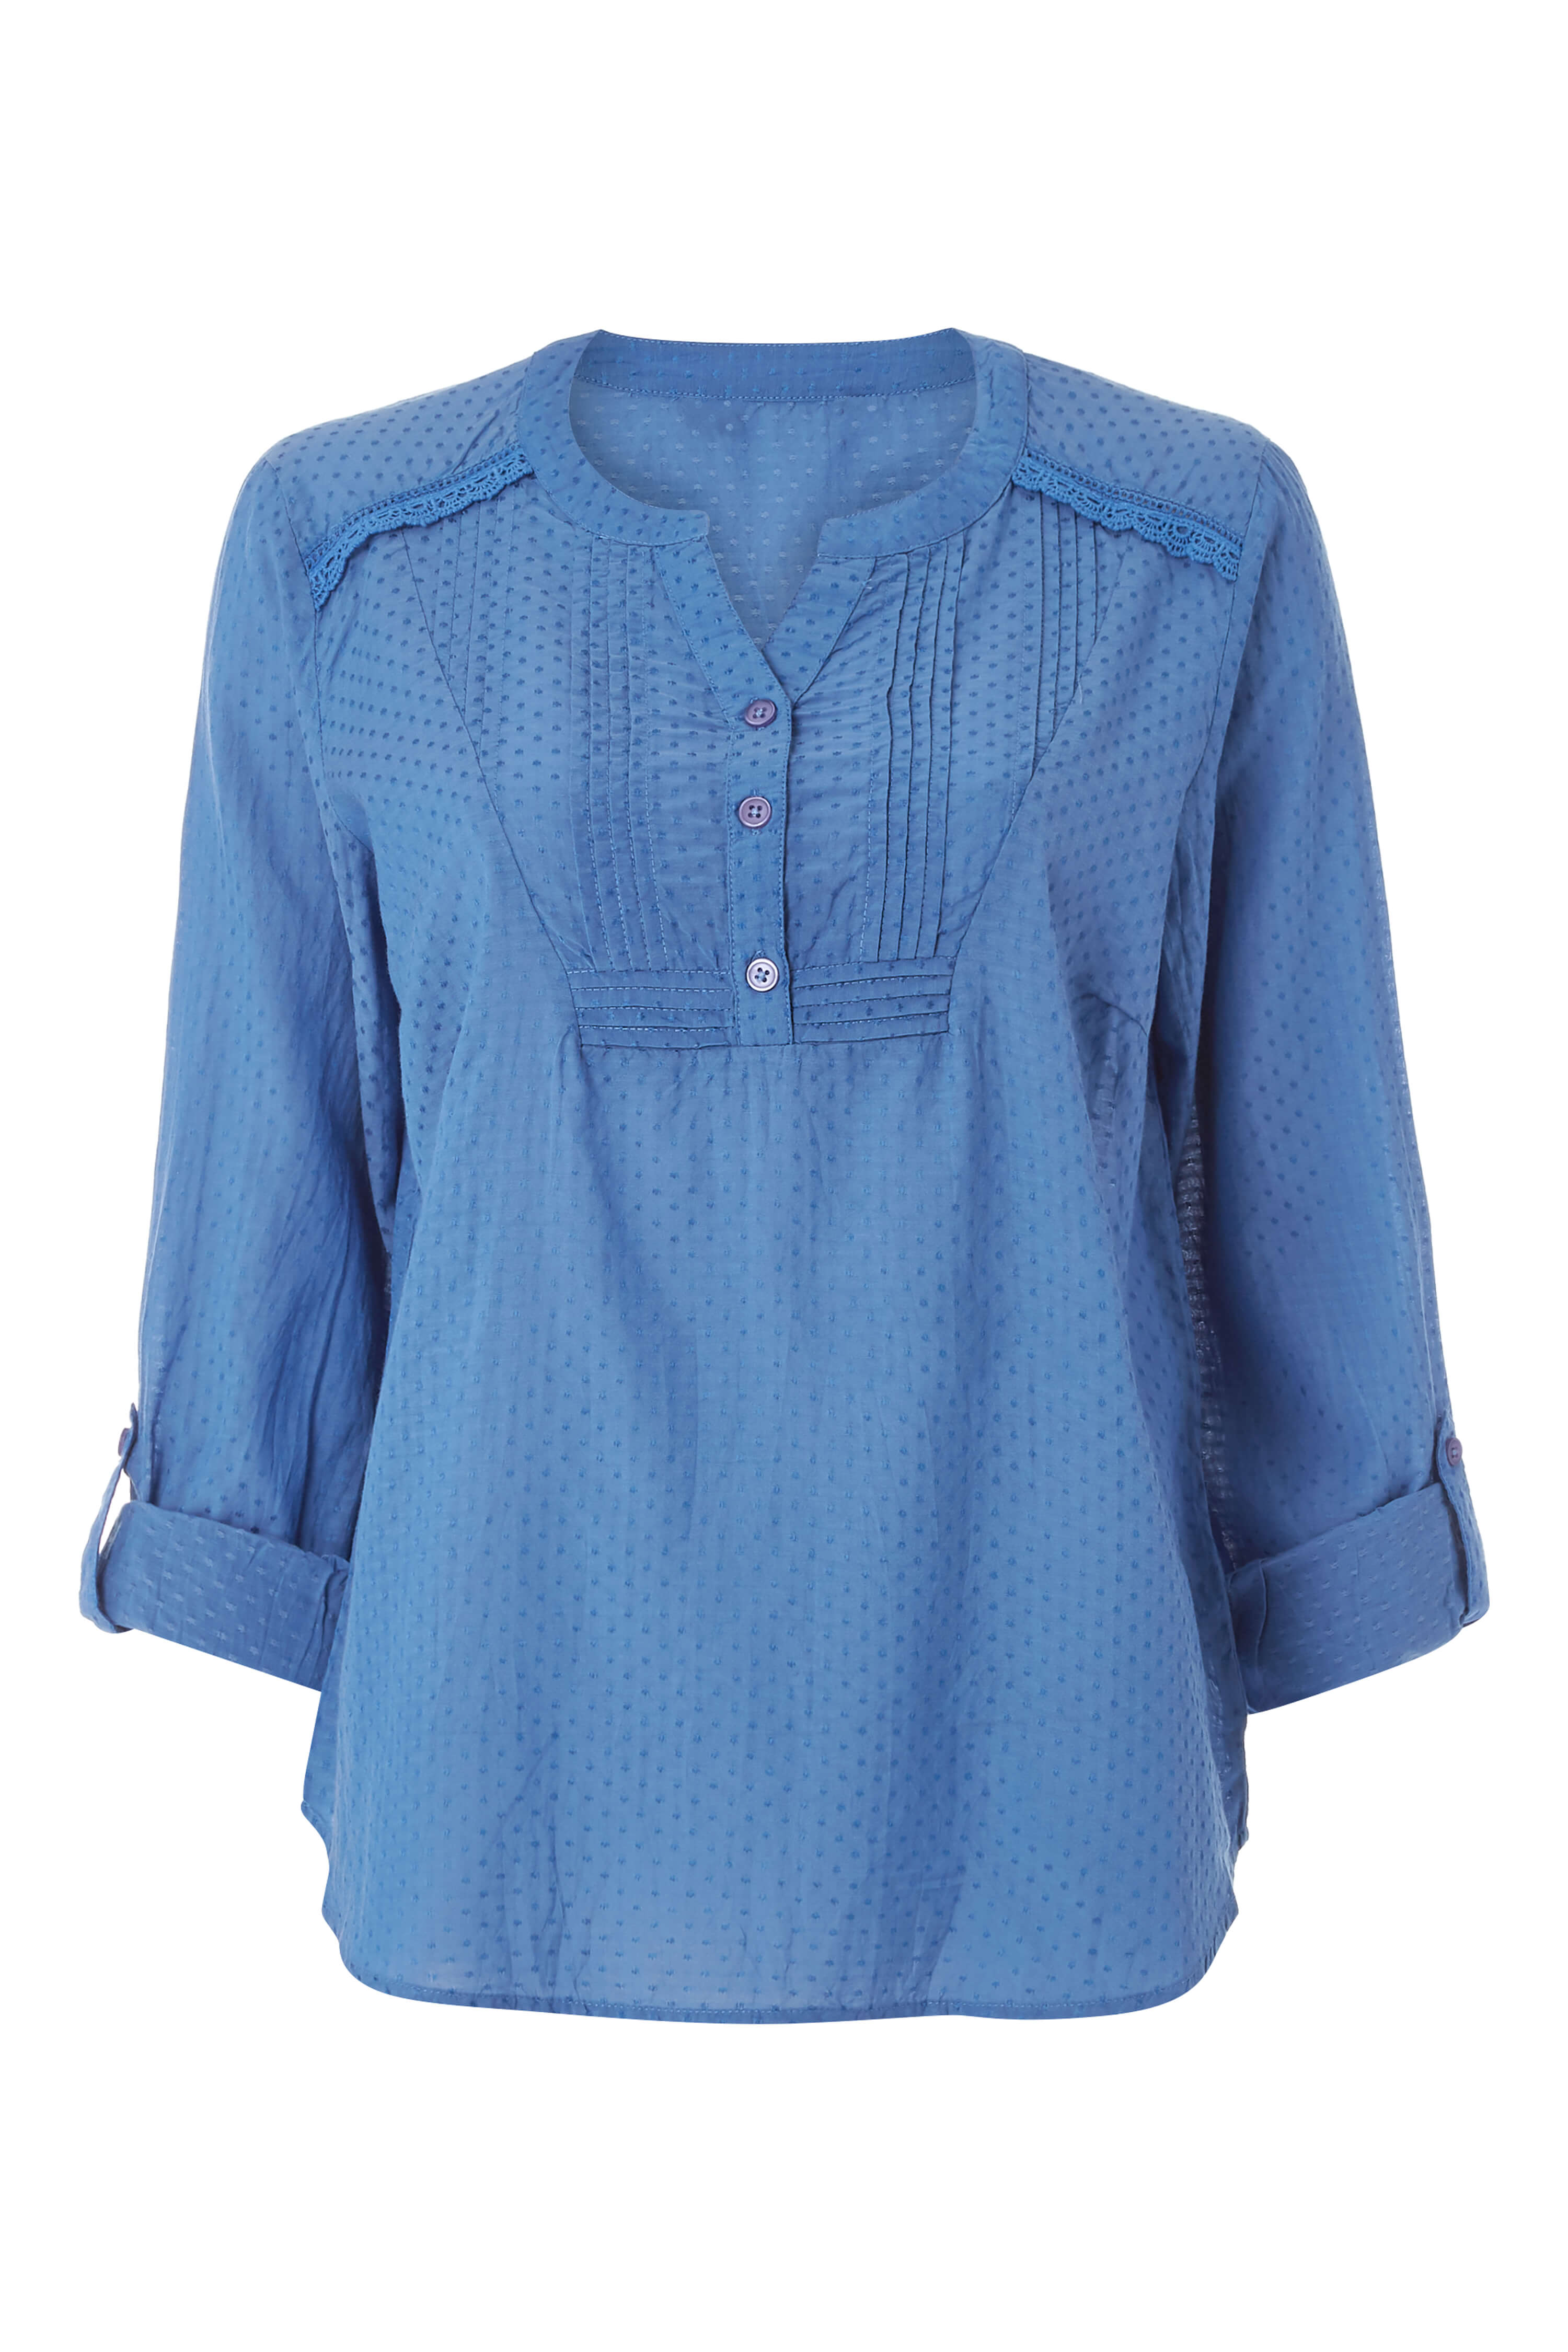 Roman-Originals-Women-039-s-Roll-Sleeve-Cotton-Mix-V-Neck-Top-Blouse-Blue thumbnail 15